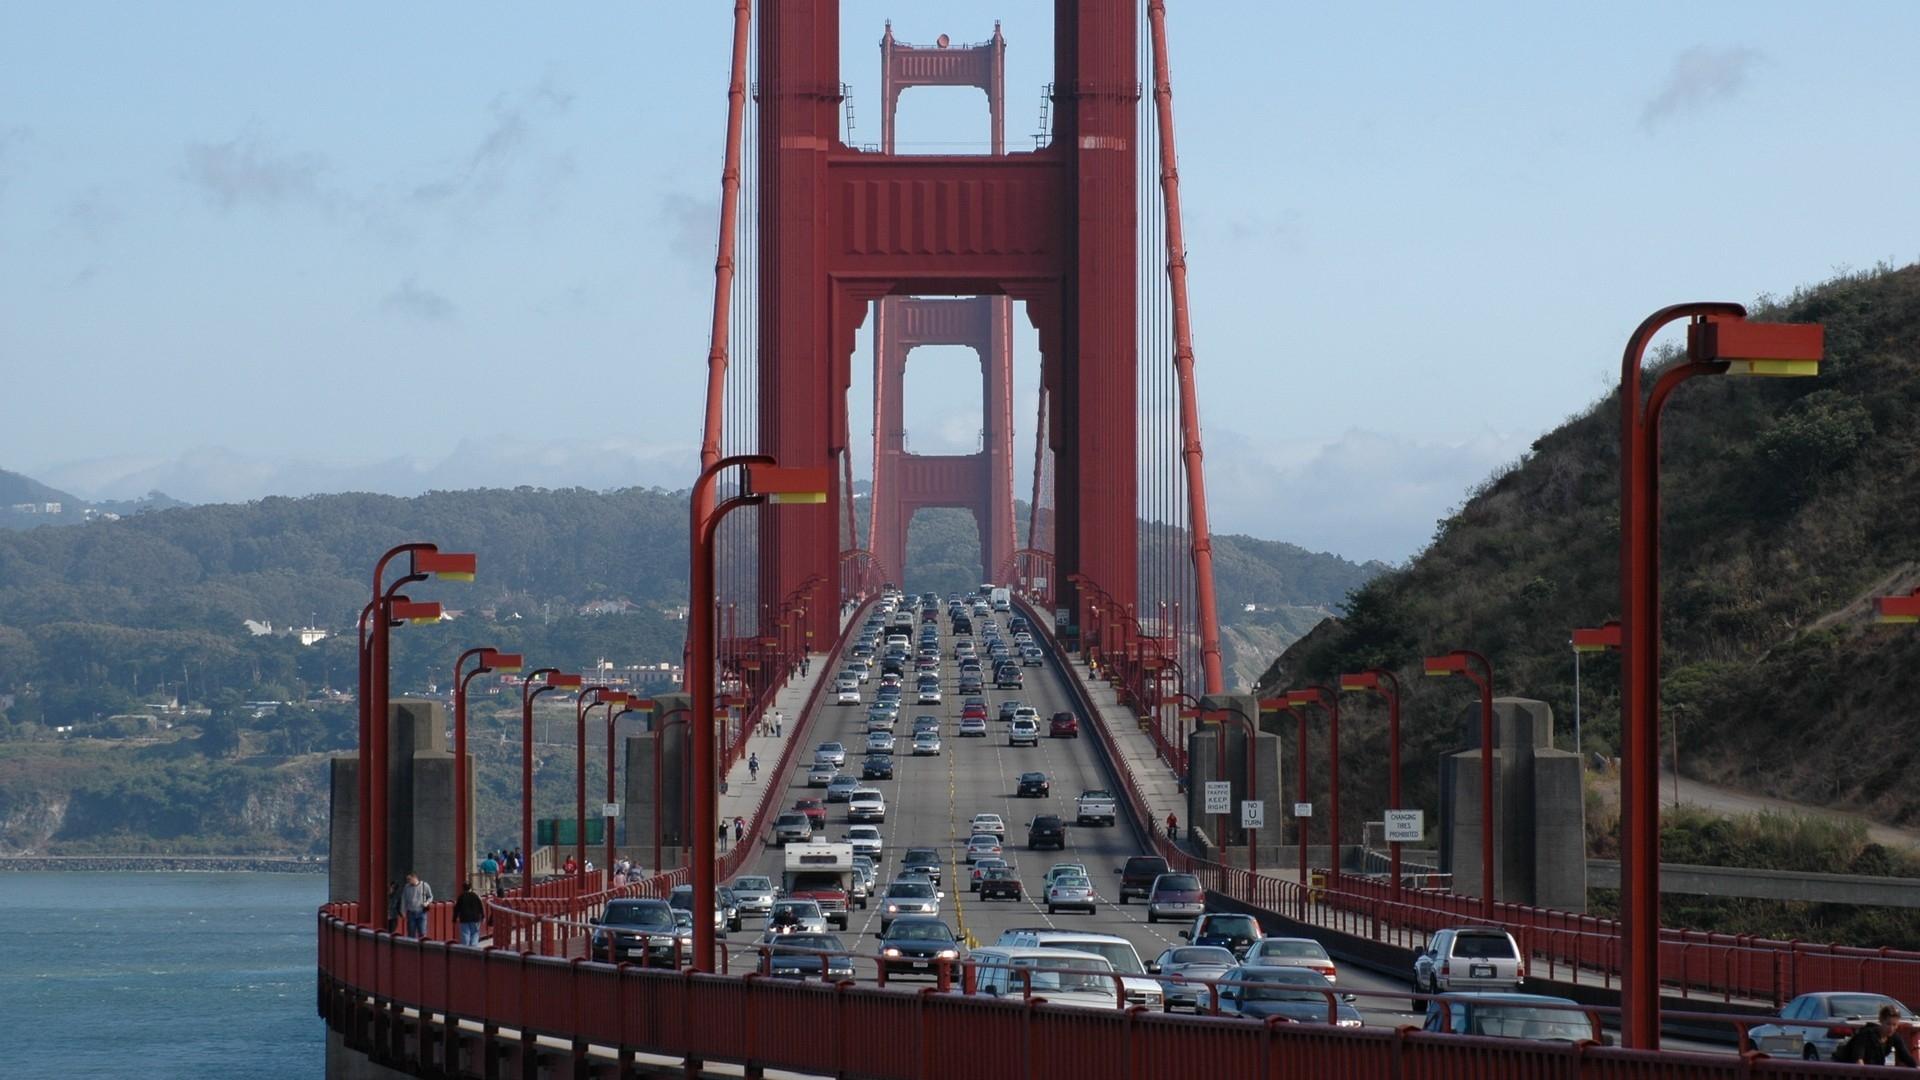 Download Wallpaper 1920x1080 Golden Gate Bridge San Francisco